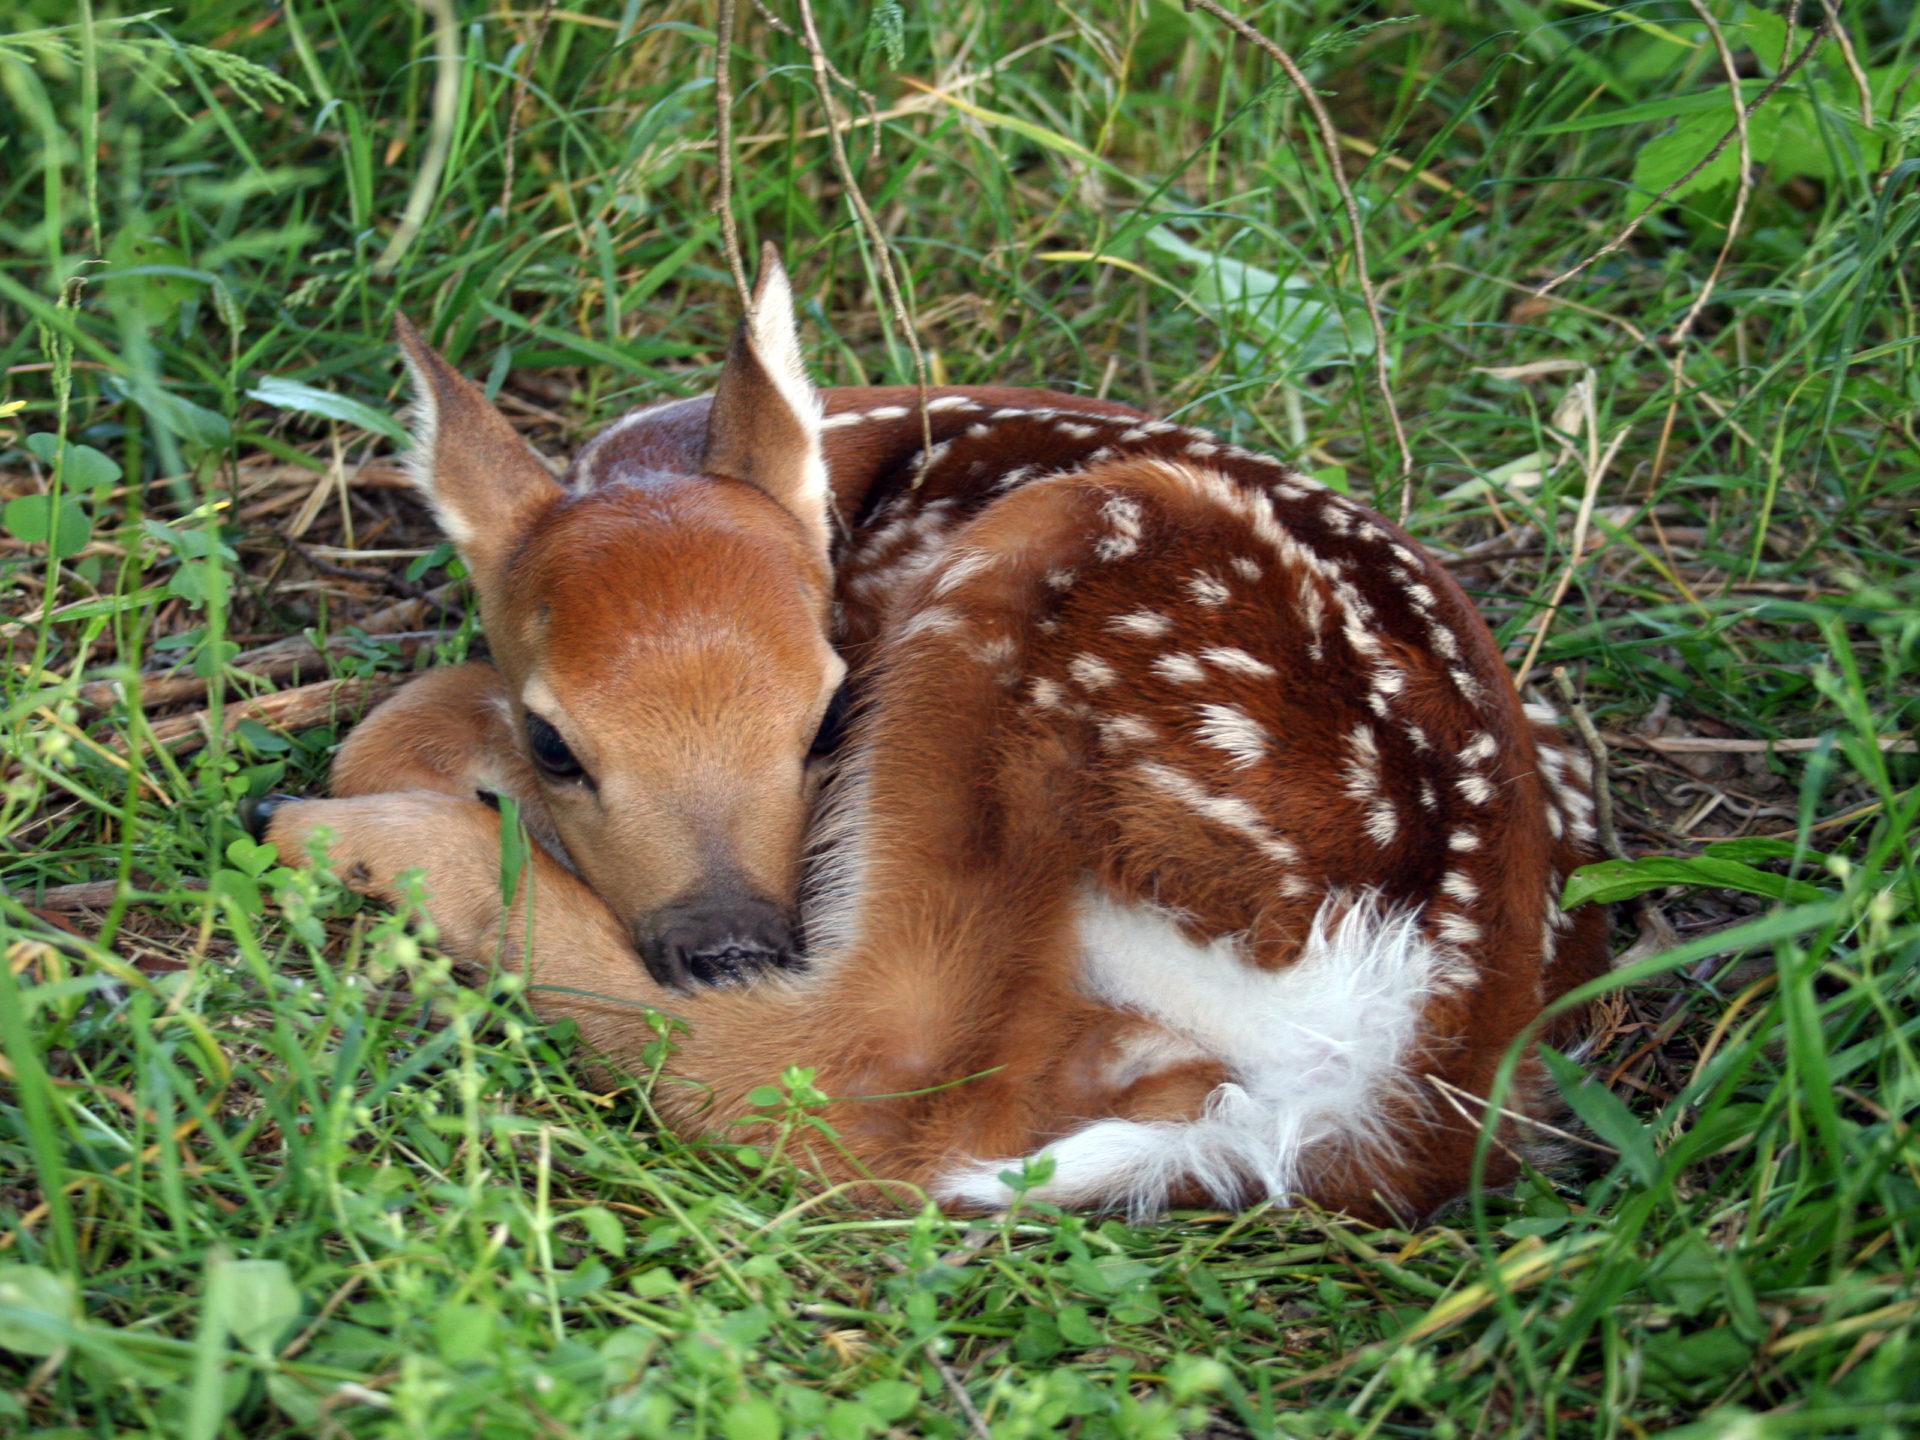 Cute Lock Screen Wallpaper For Ipad Baby Deer Hd Wallpaper 59207 Wallpapers13 Com